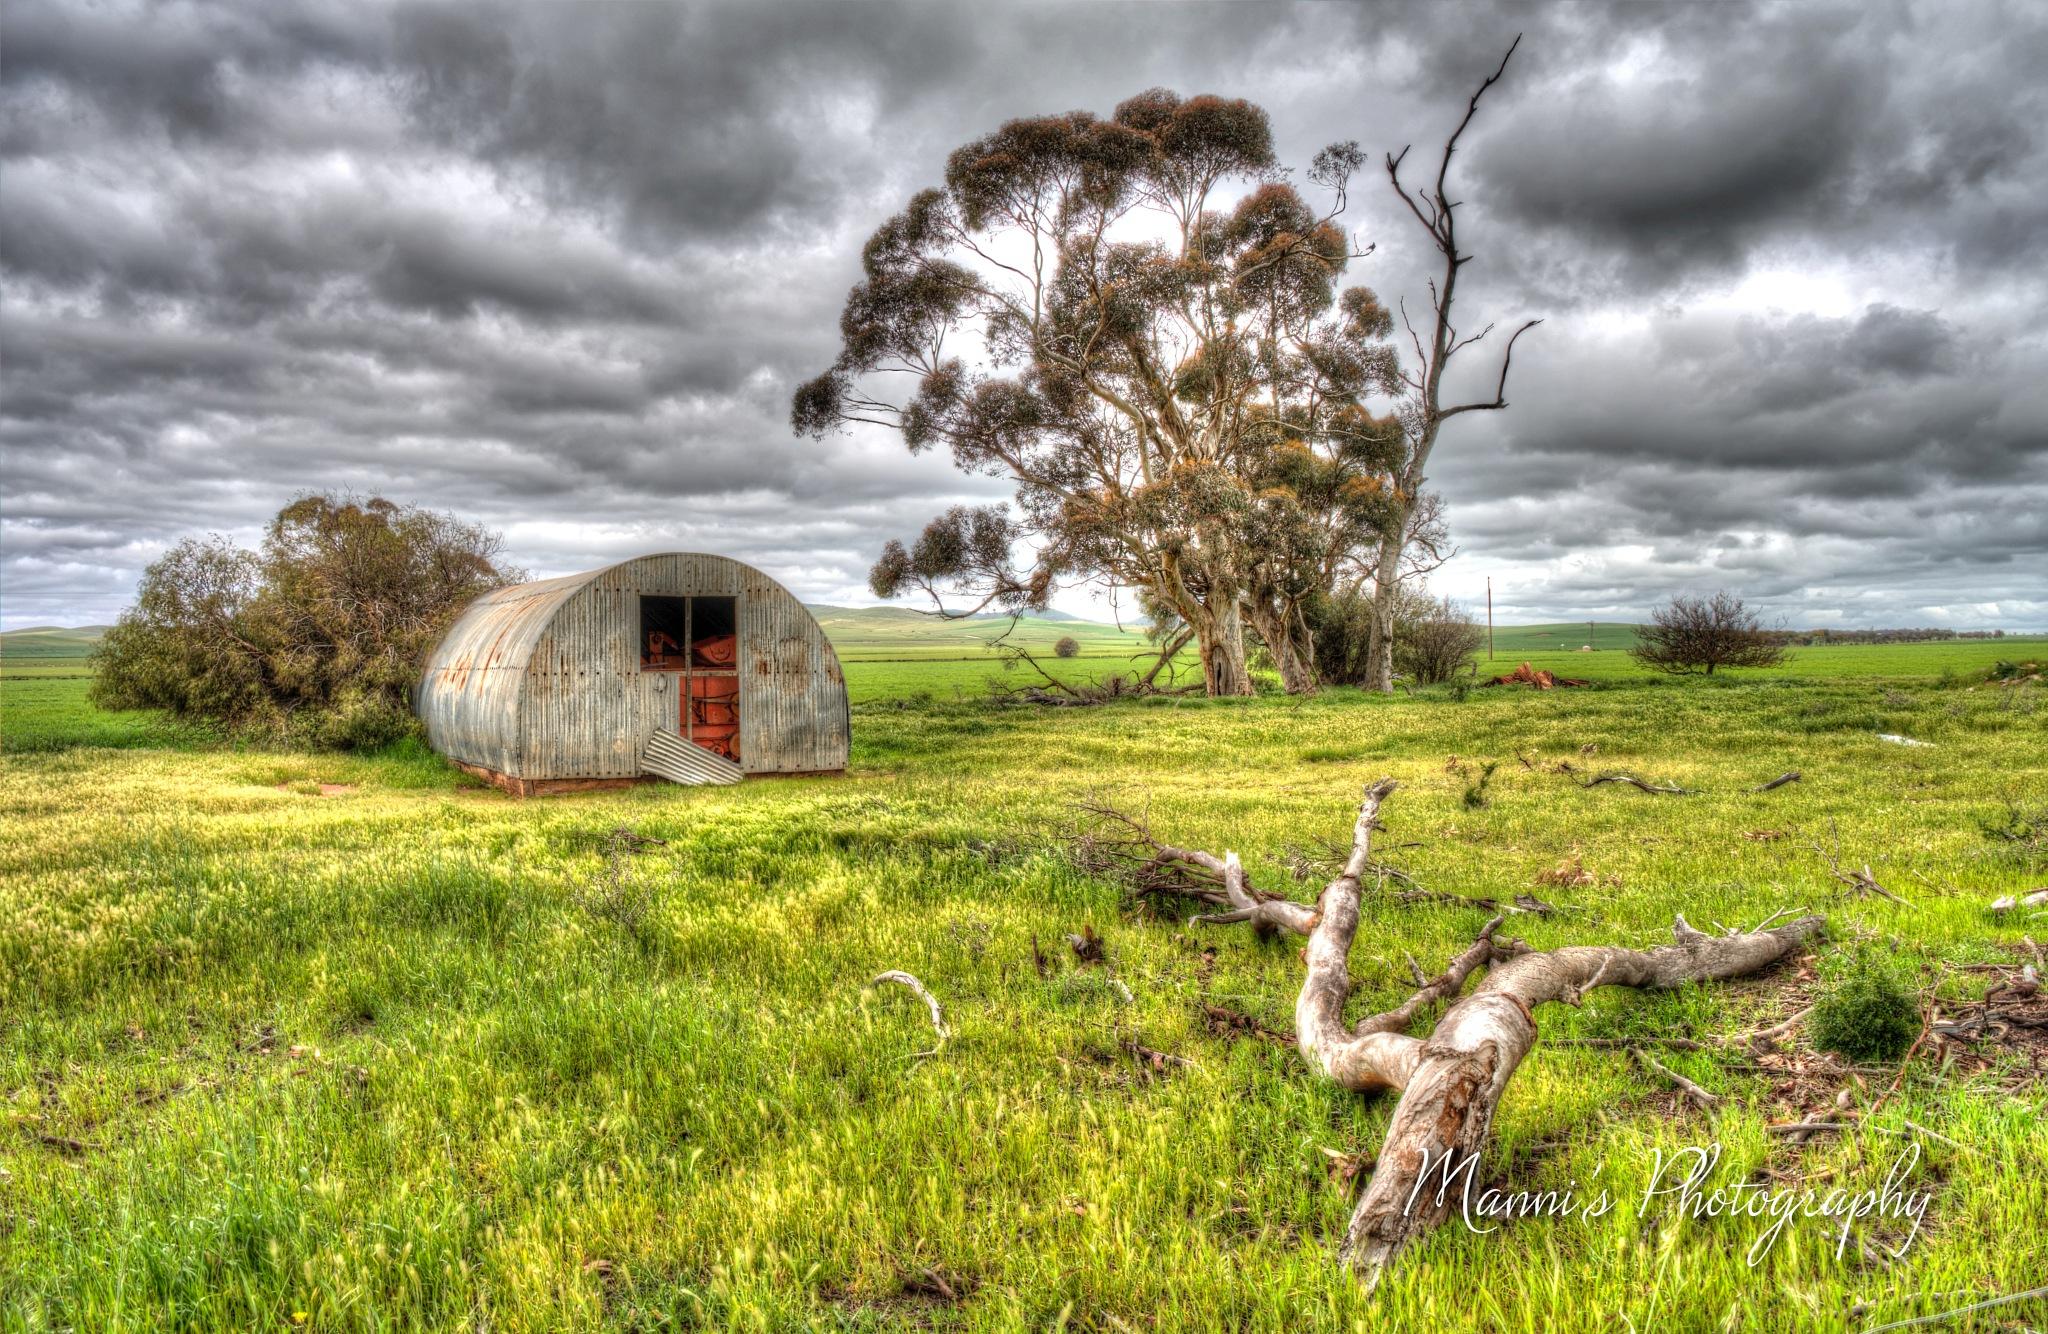 Metal Arched Farm Building by Manni